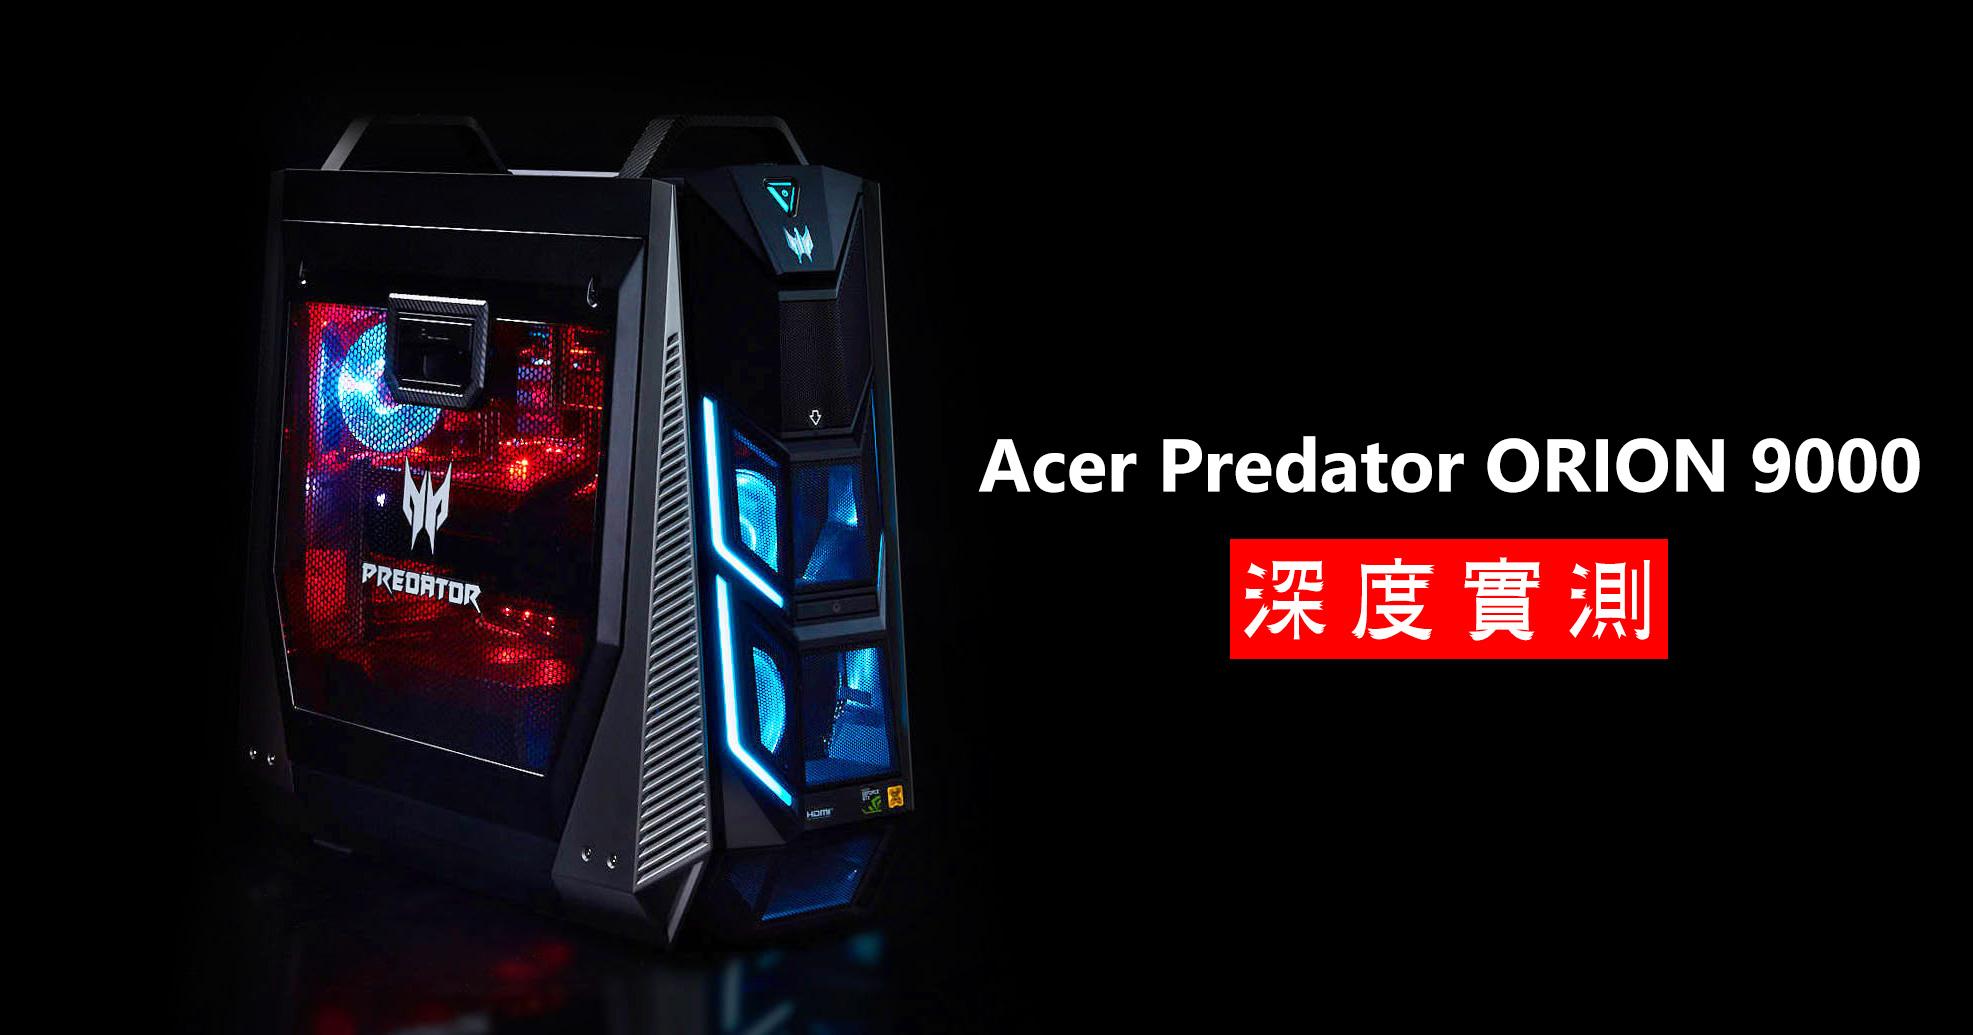 Acer Predator ORION 9000 深度評測:外型、效能都堪稱頂尖,重度電競玩家的夢想機種!